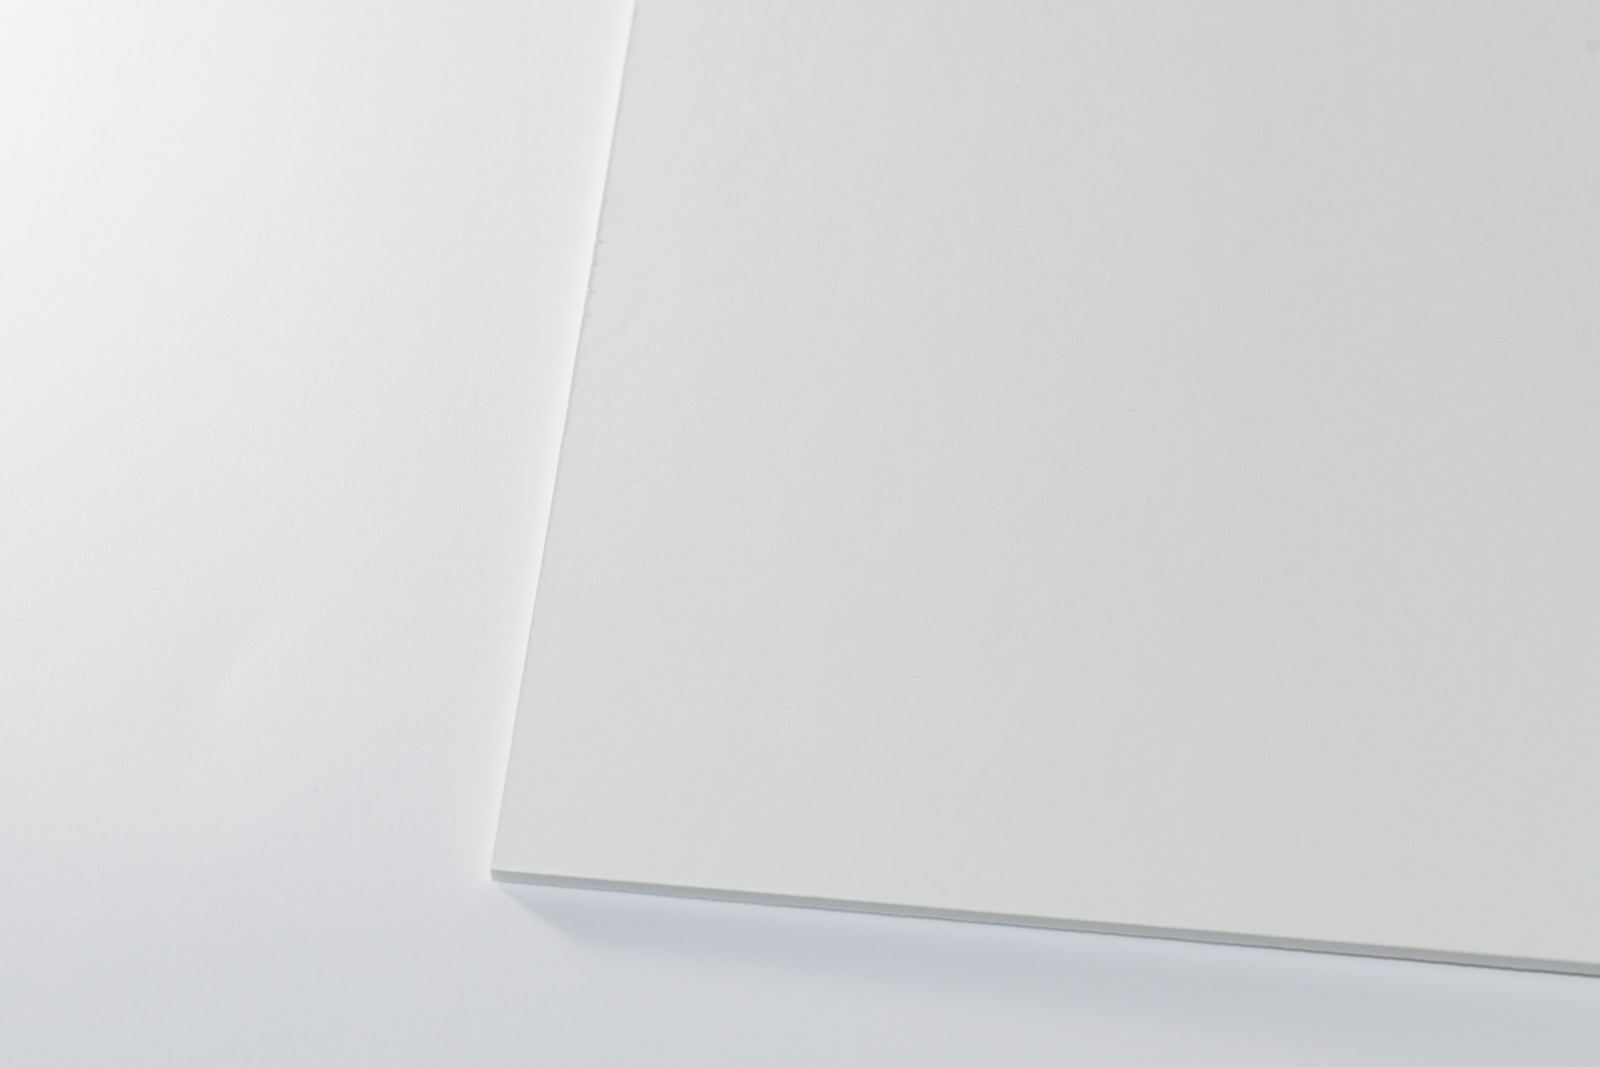 Passpartoutkarton classic NEW creme/weiß